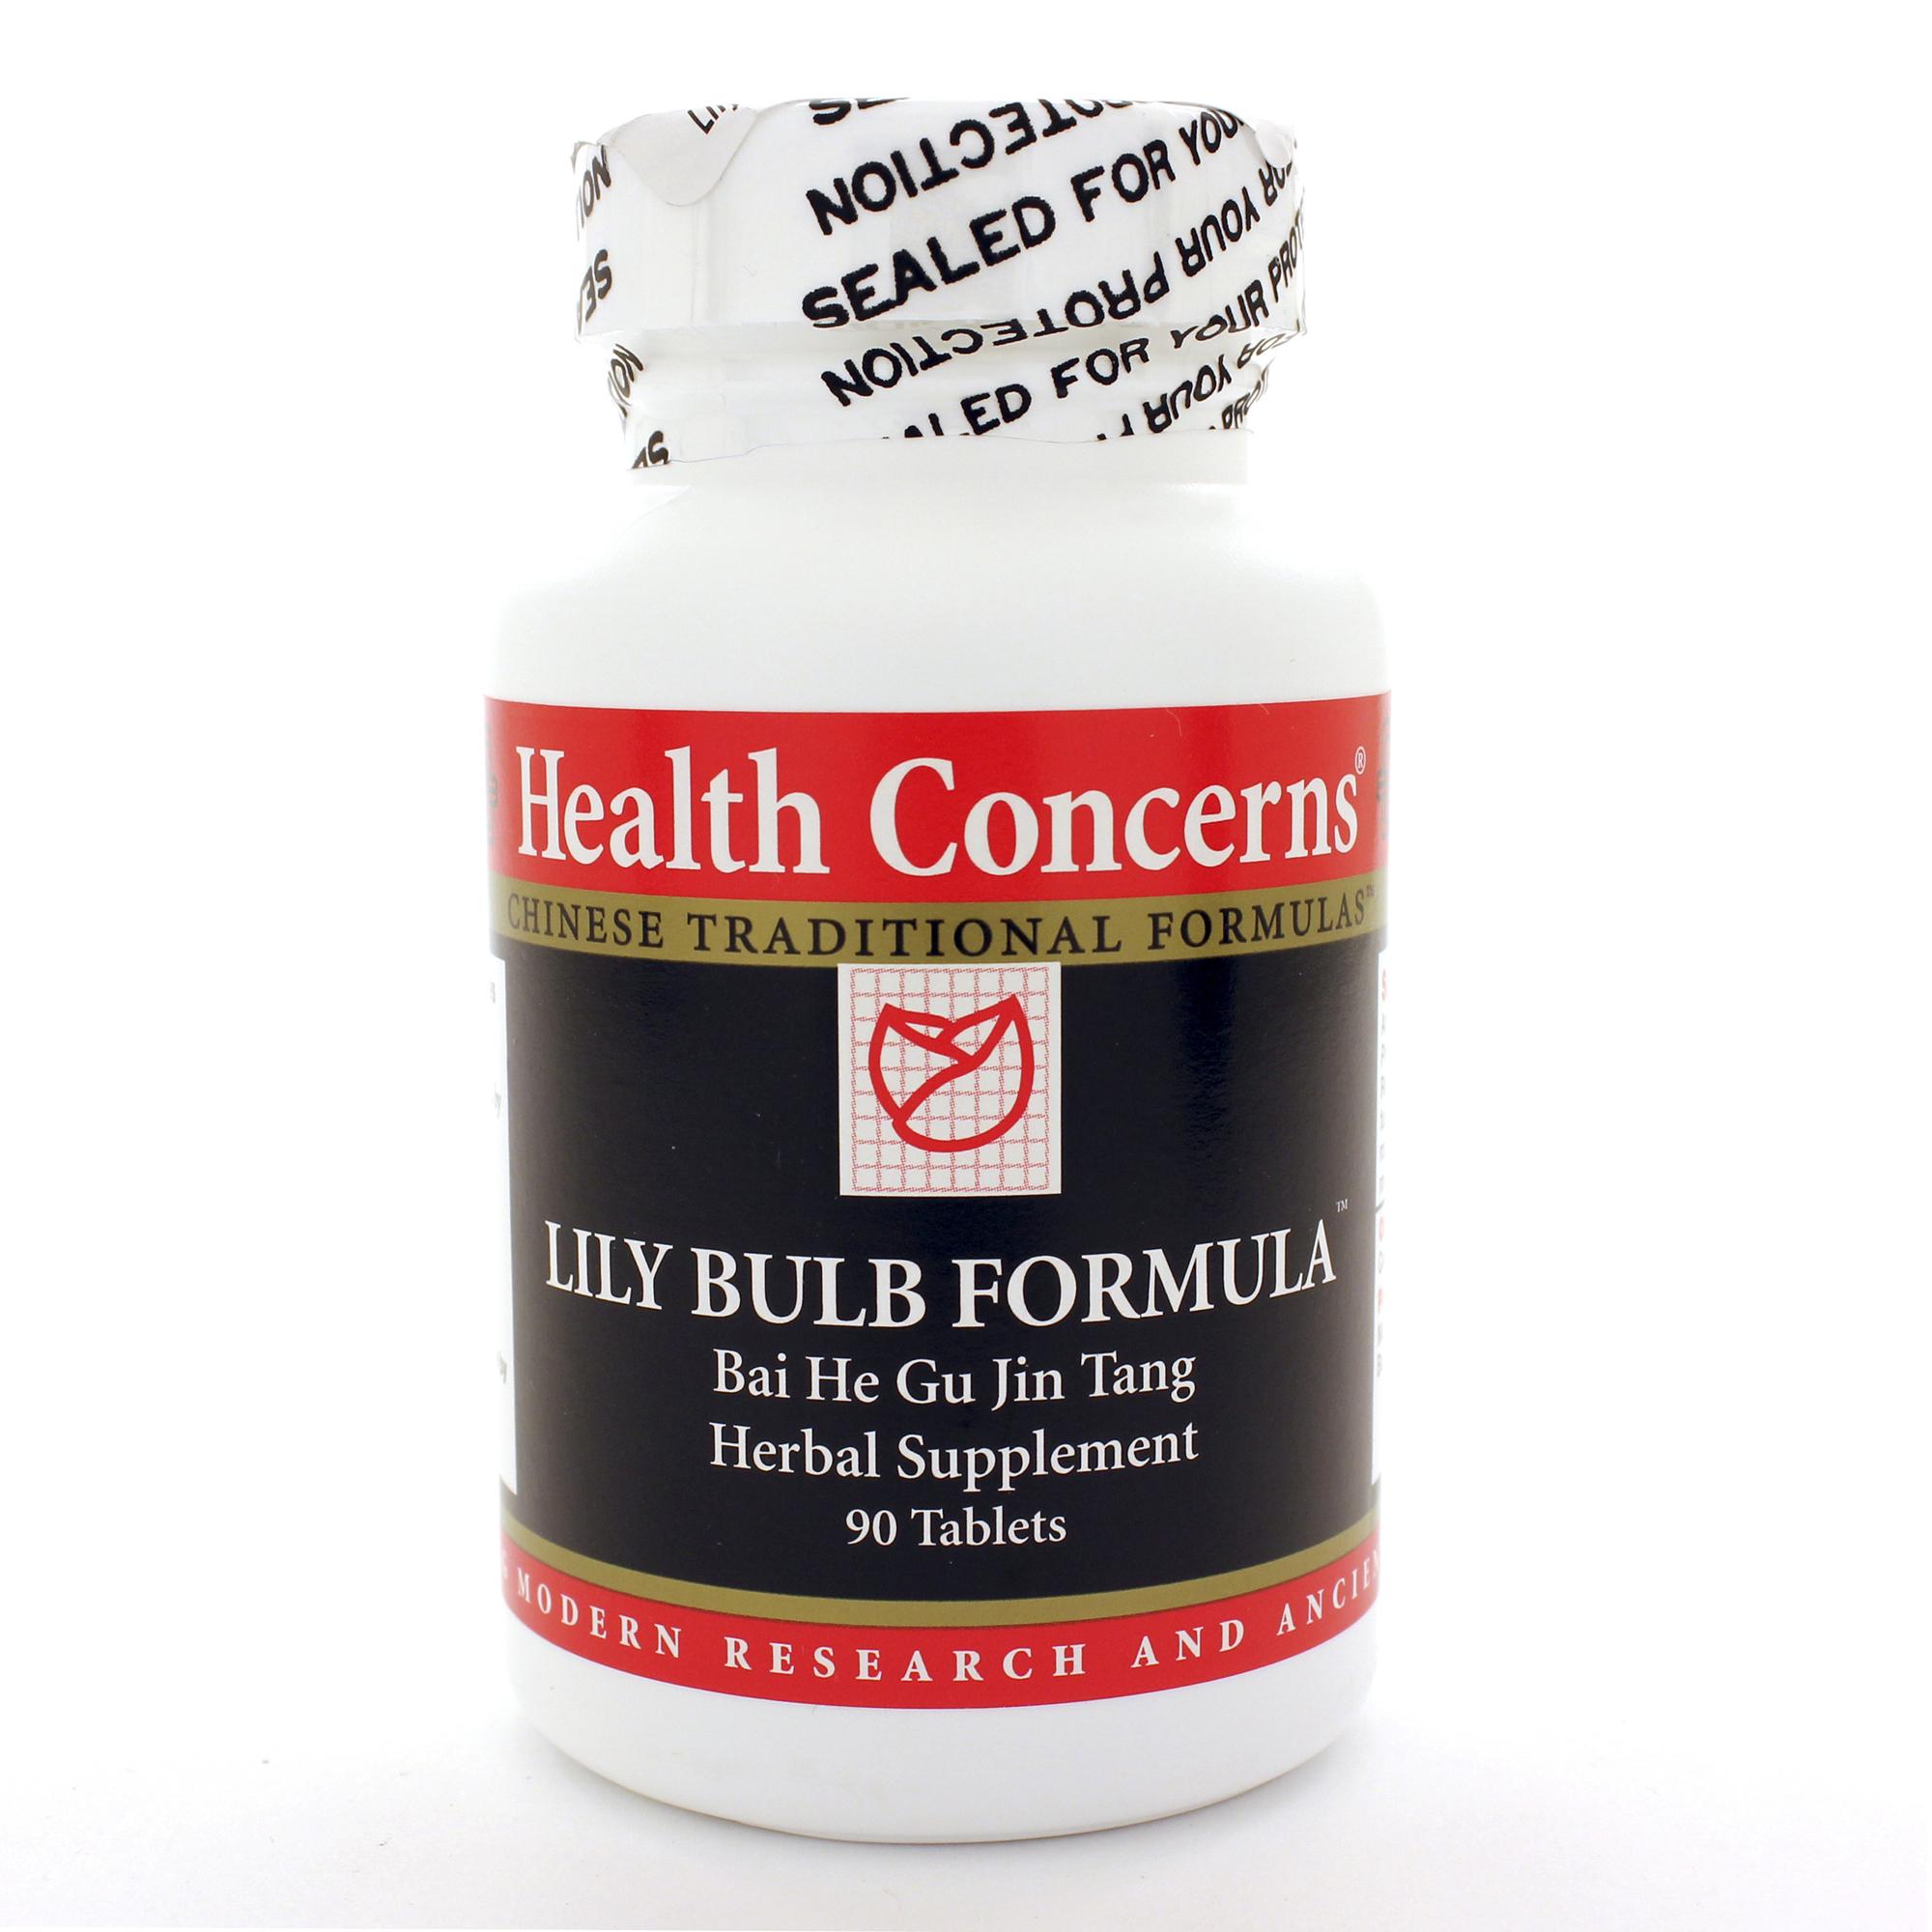 Health Concerns Lily Bulb Formula 90t